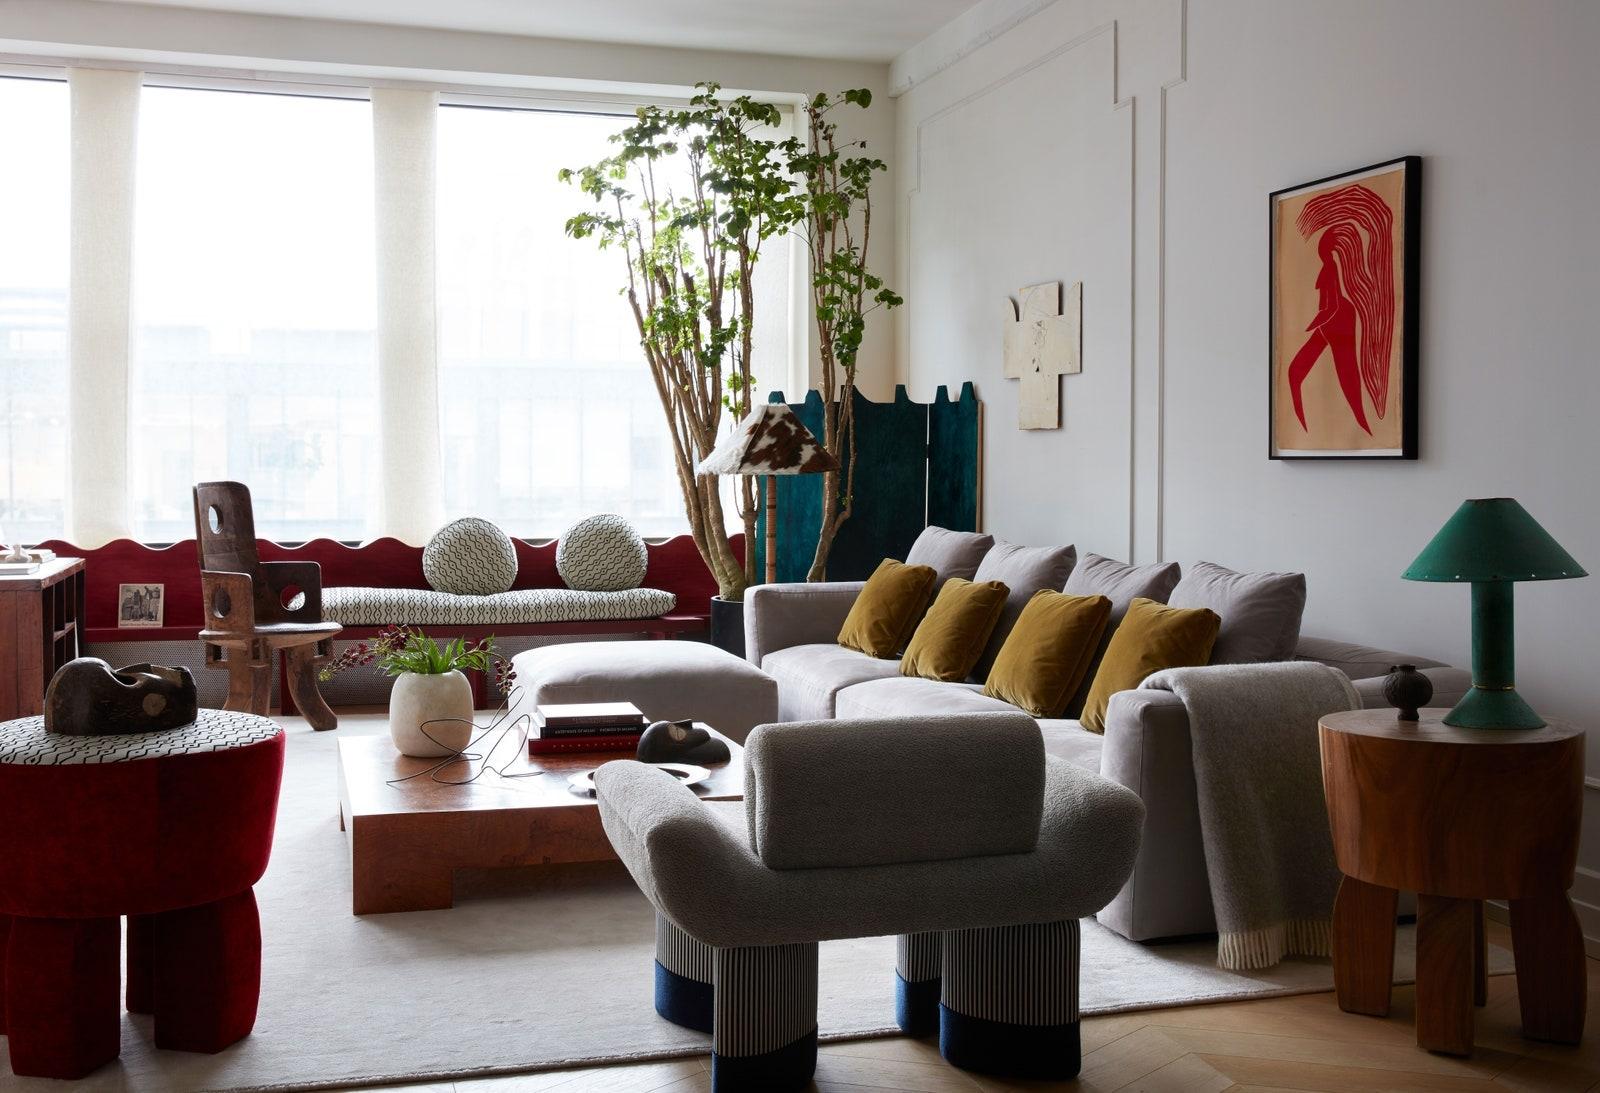 A living room in a Brooklyn loft